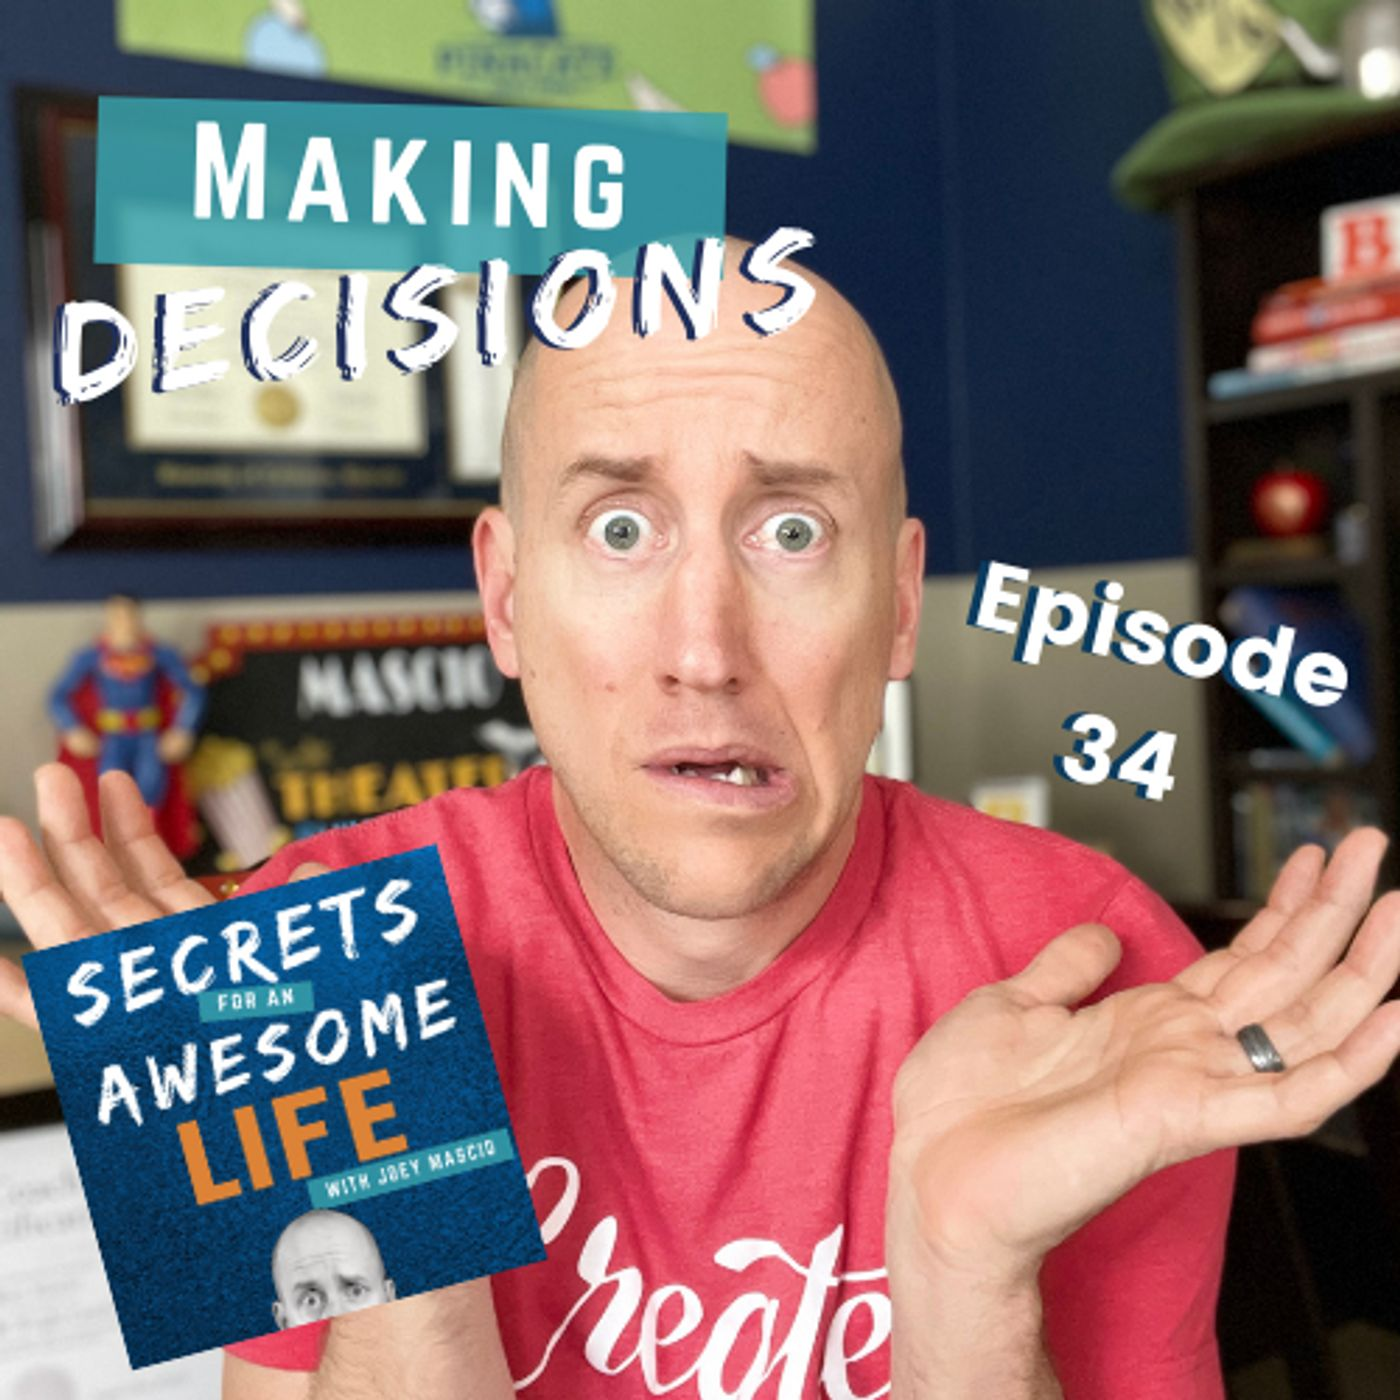 Making Decisions